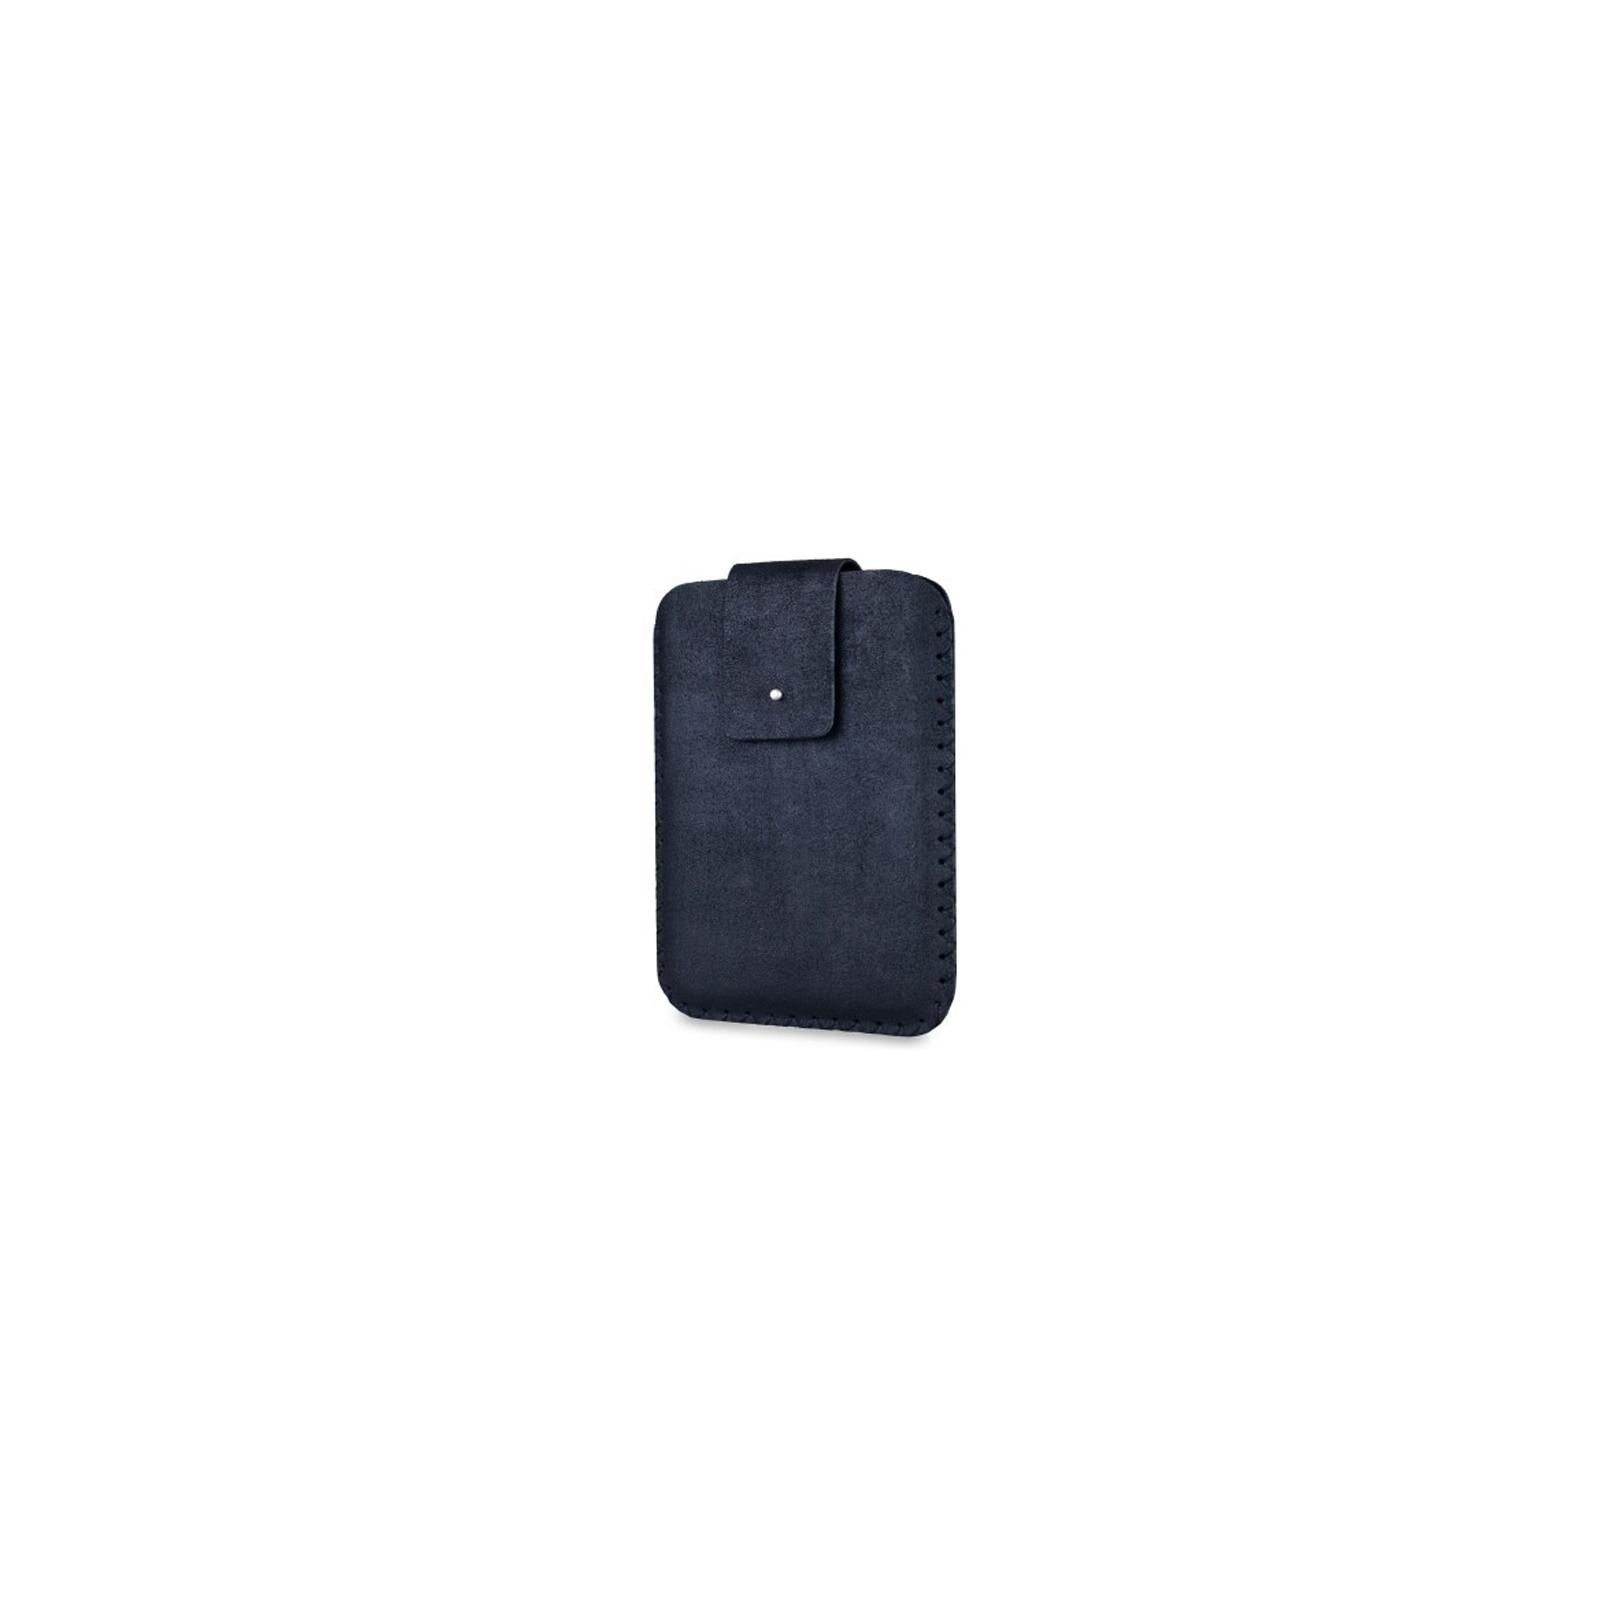 Чехол для планшета LLC HM 01 GX10 Sox